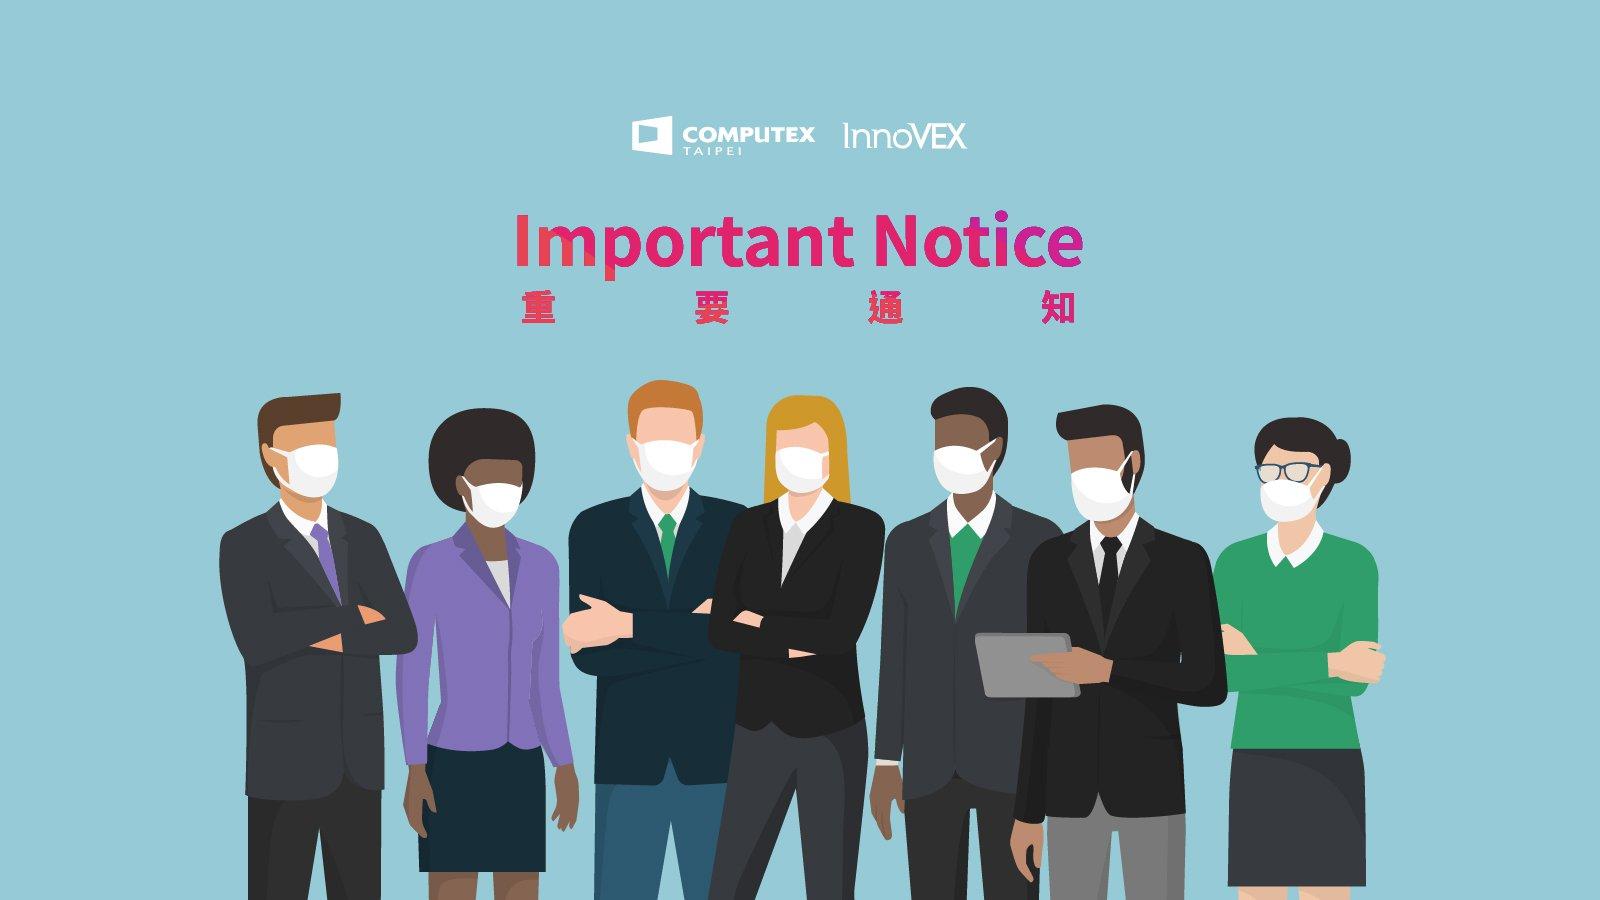 Computex 2021 onsite exhibition has been canceled – VideoCardz.com